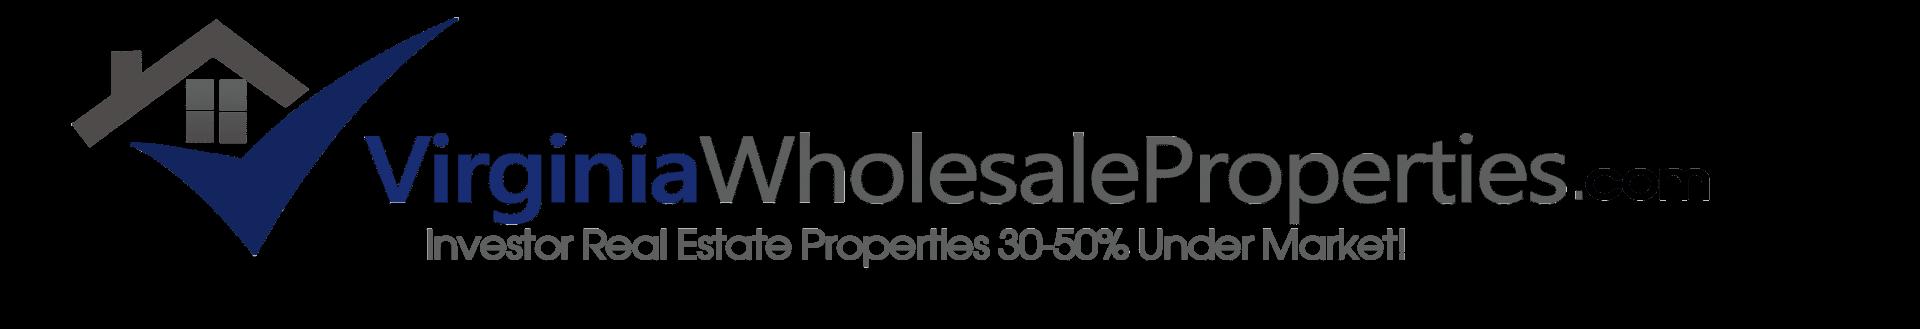 Virginia Wholesale Properties logo